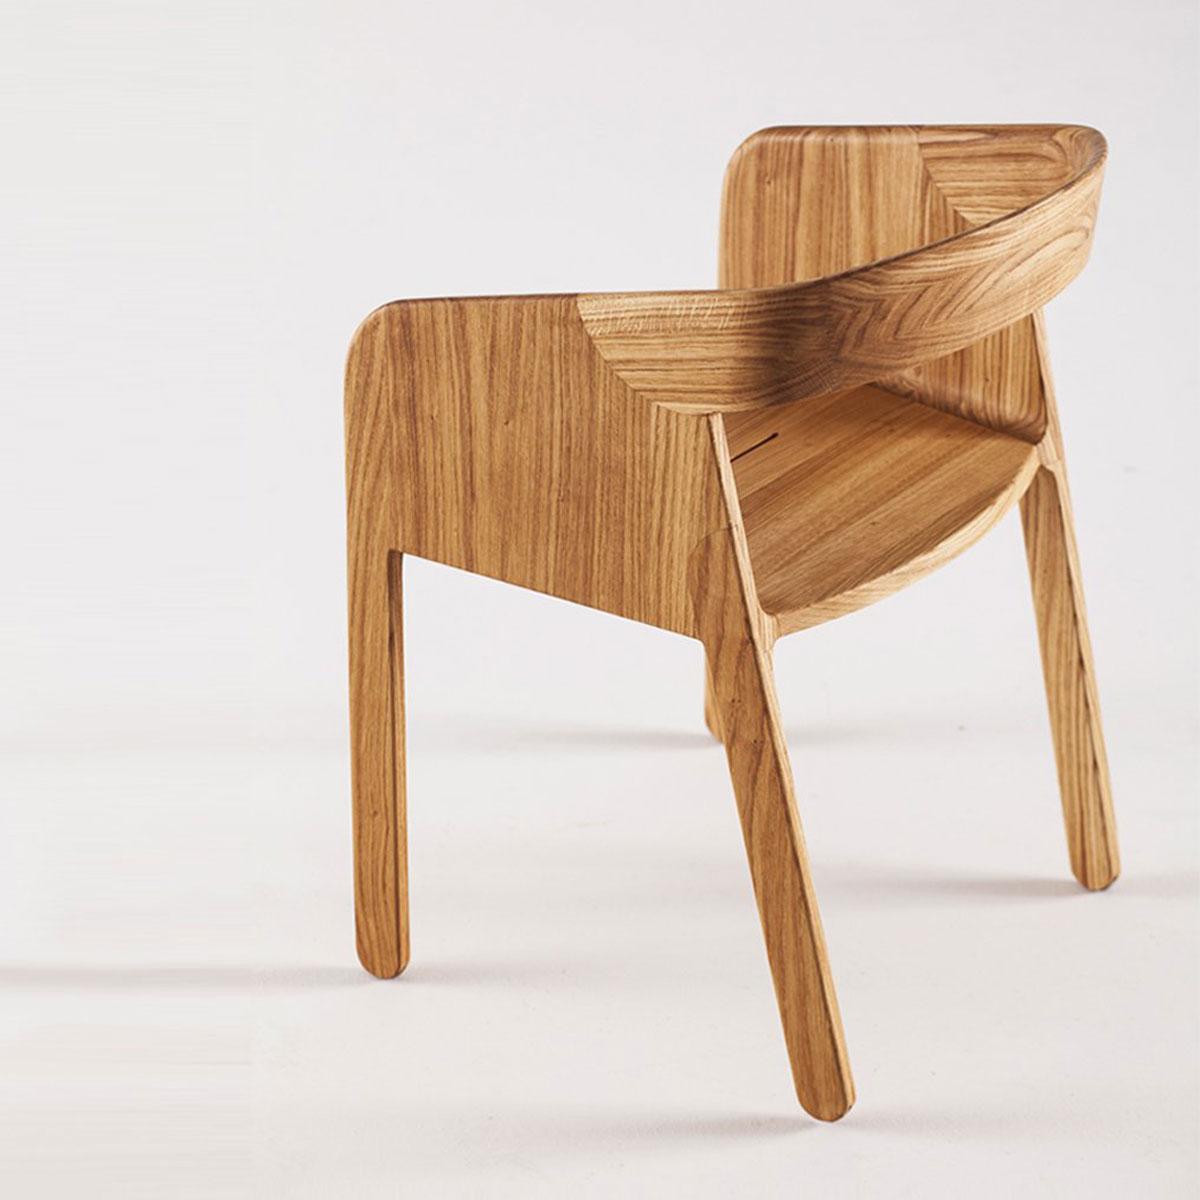 Silla malena de artisan en madera moderna artesana y for Sillas madera modernas